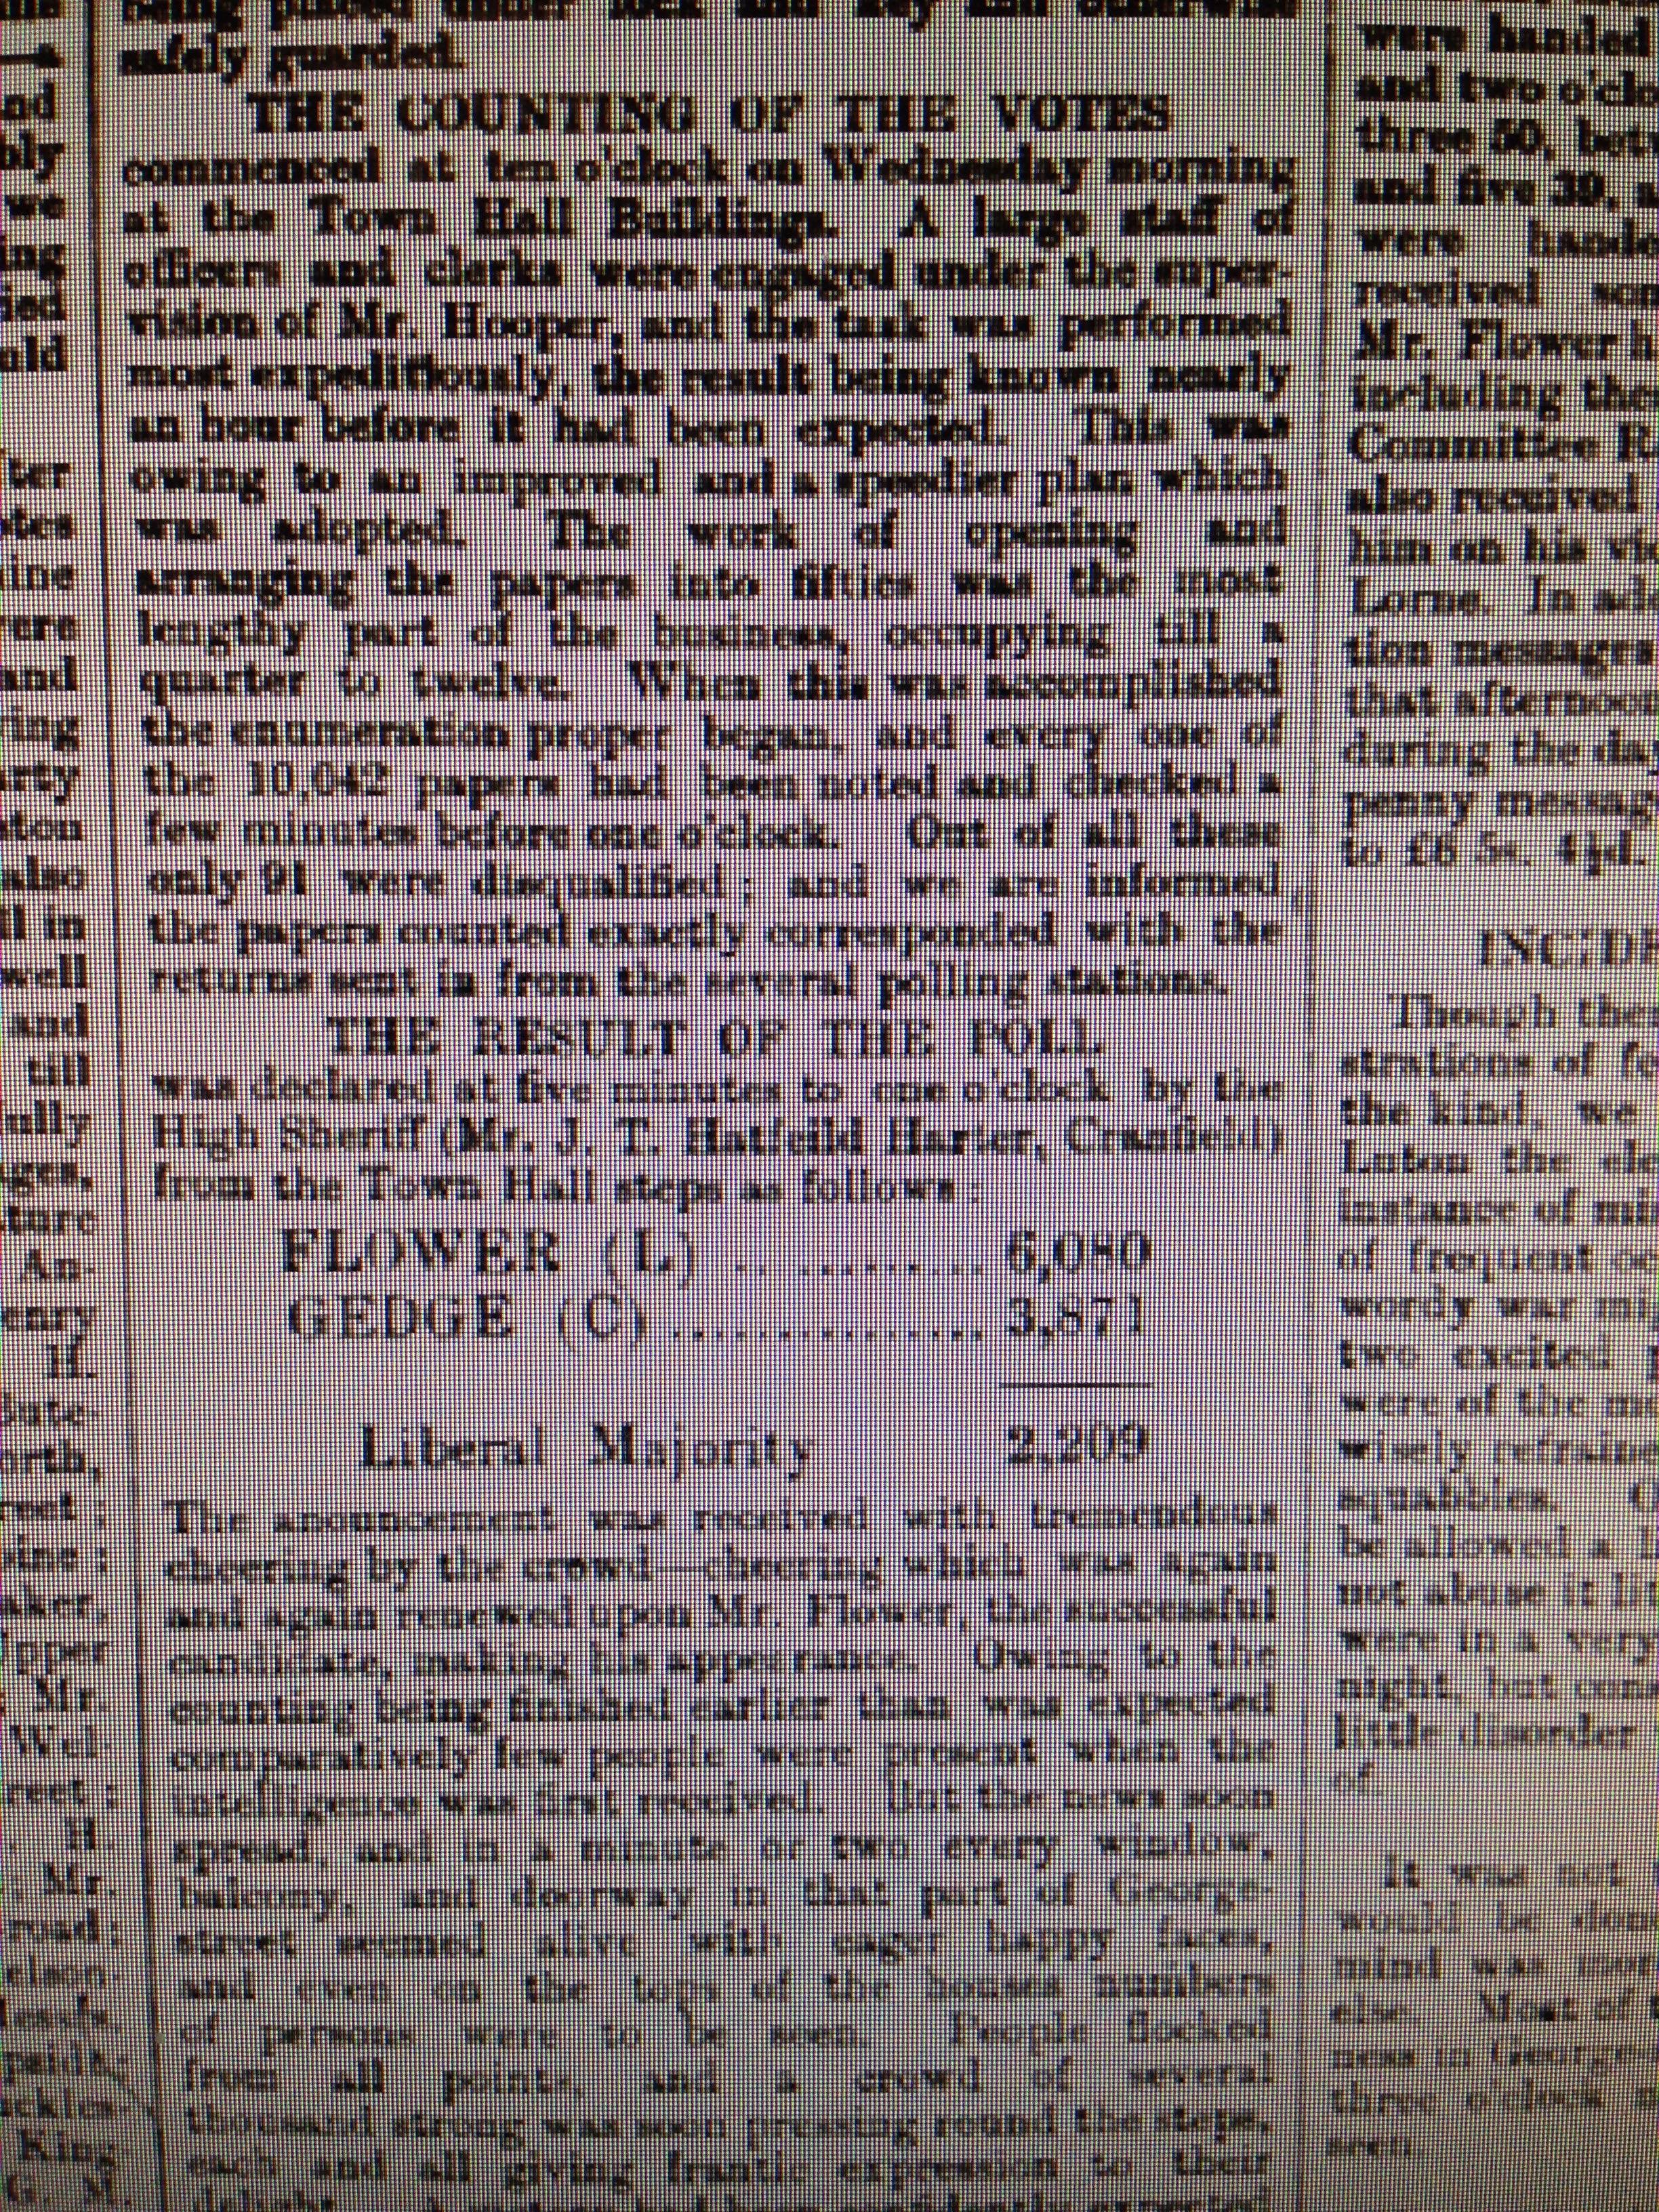 Luton Reporter 5/12/1885